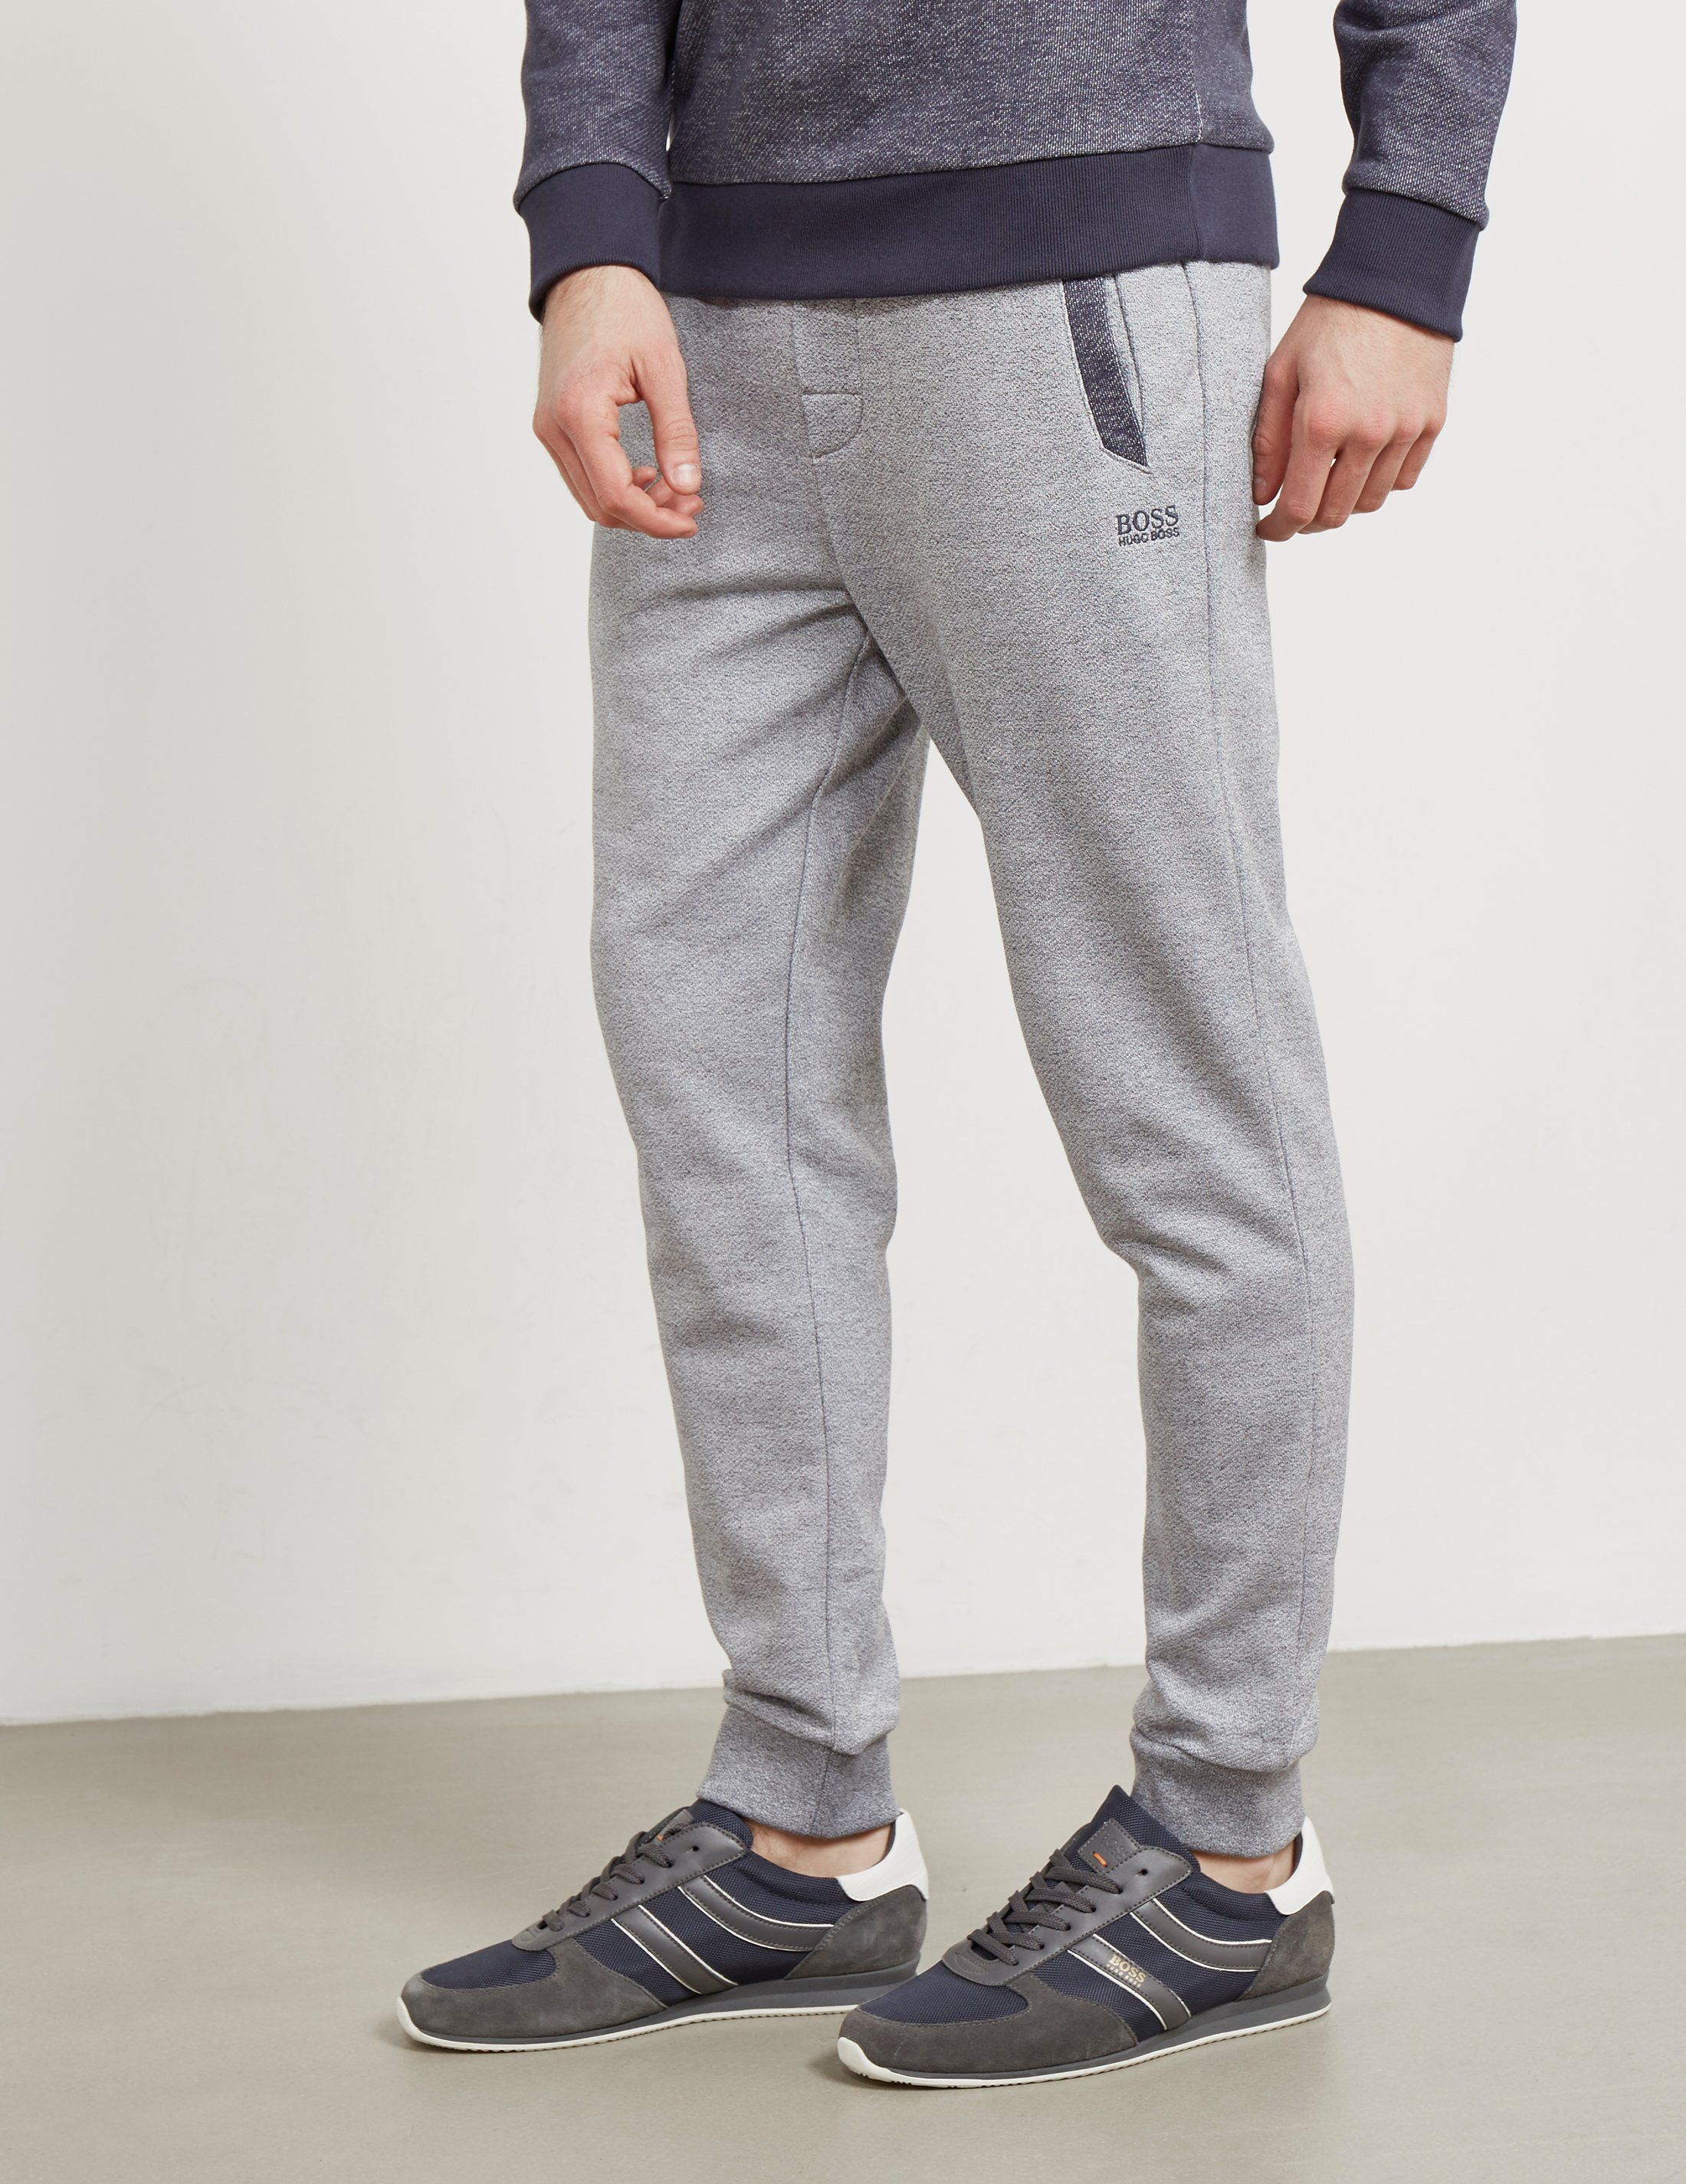 BOSS Marl Cuffed Track Pants